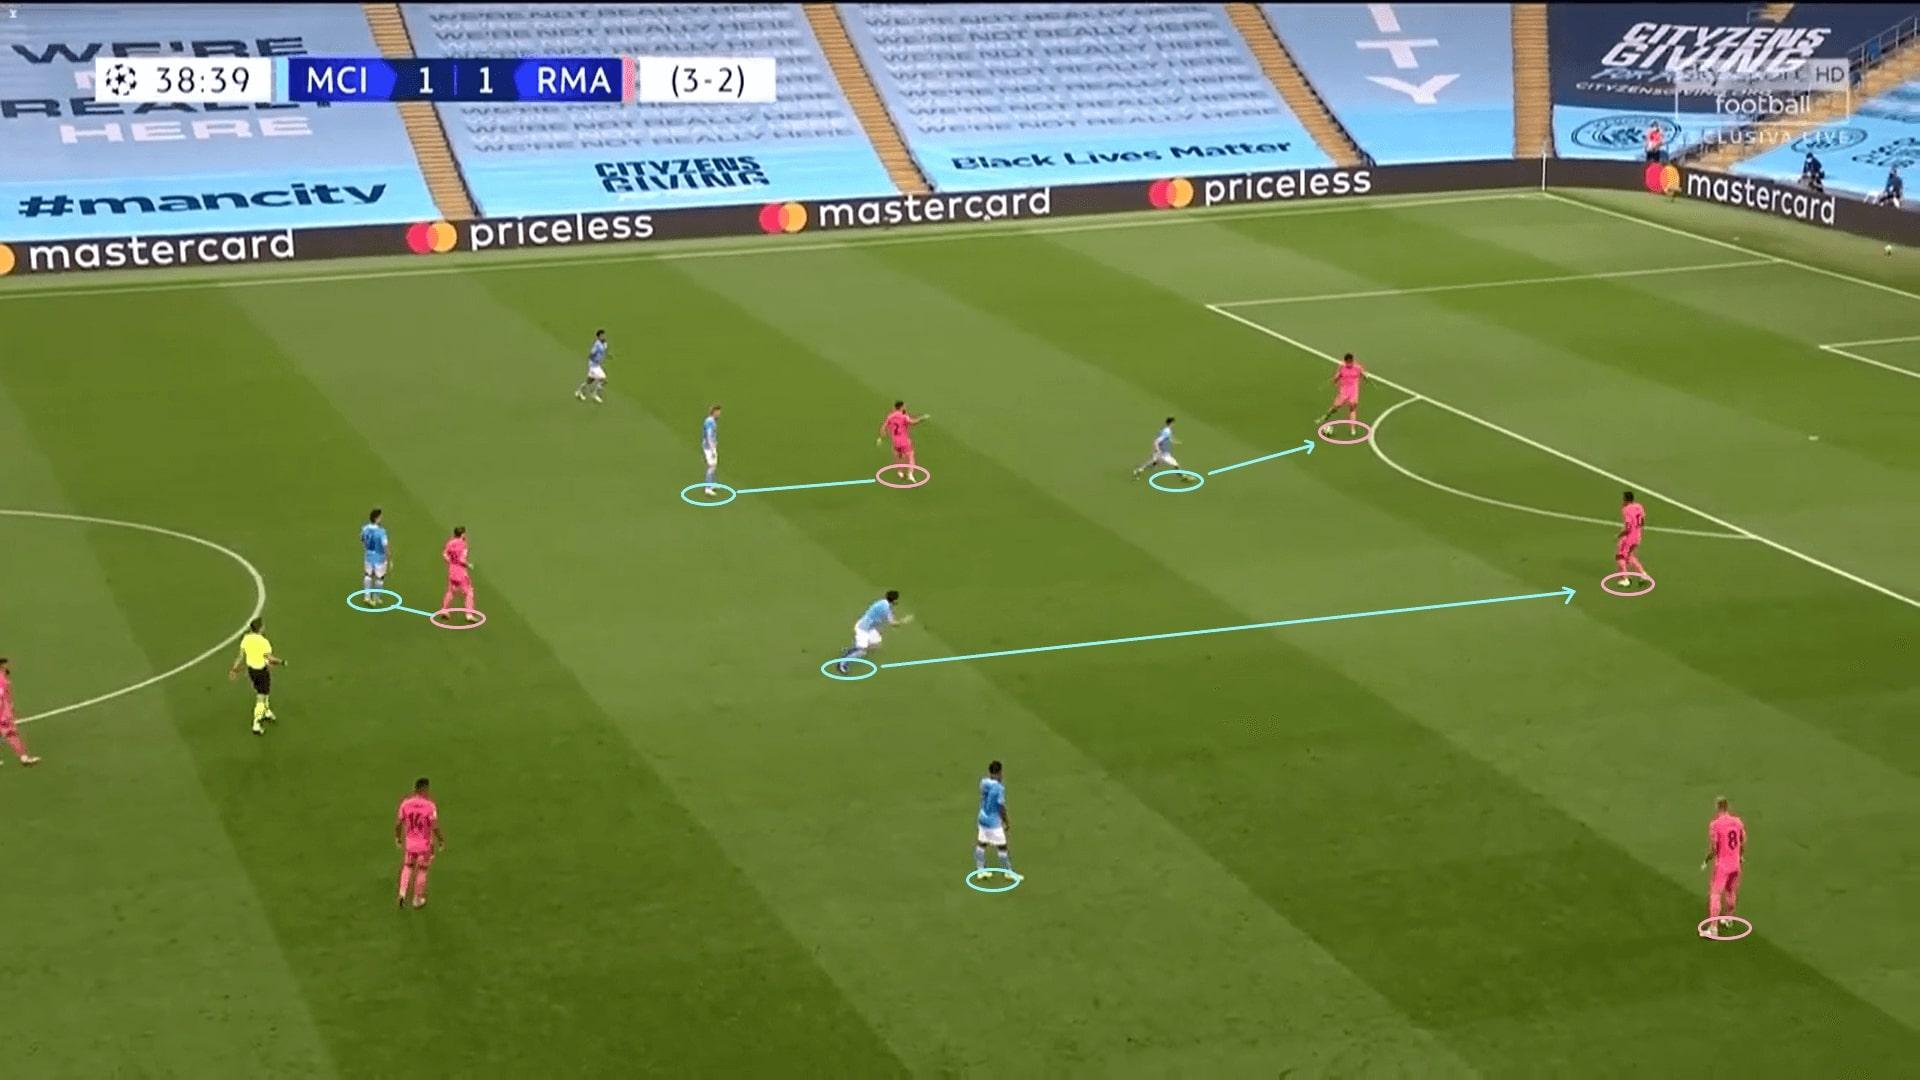 UEFA Champions League 2019/20: Manchester City vs Real Madrid - tactical analysis tactics